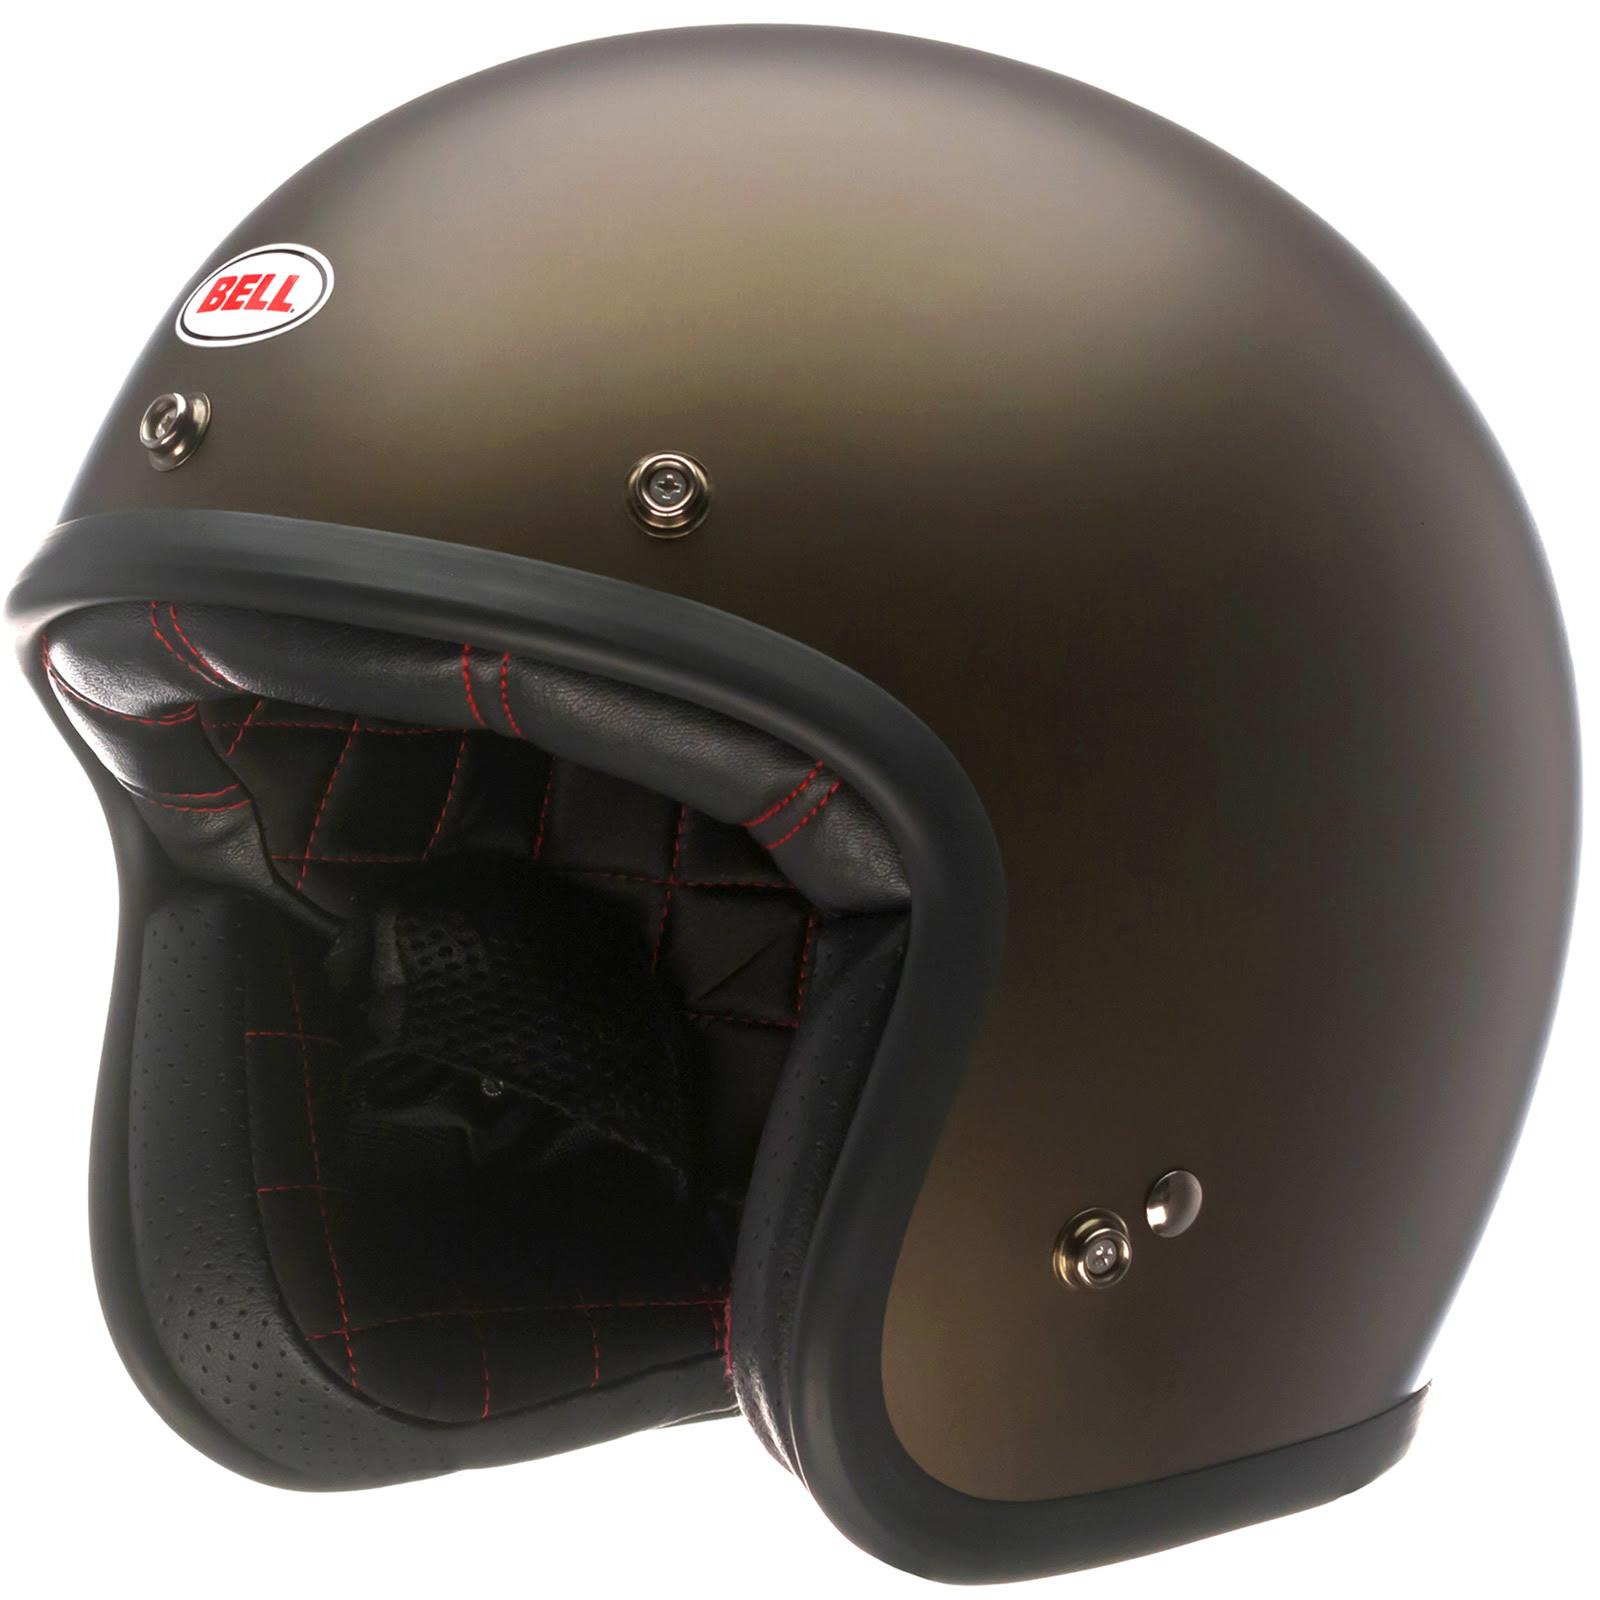 Bell Custom 500 Low Profile Plain Vintage Retro Motorcycle Scooter Bike Helmet  eBay